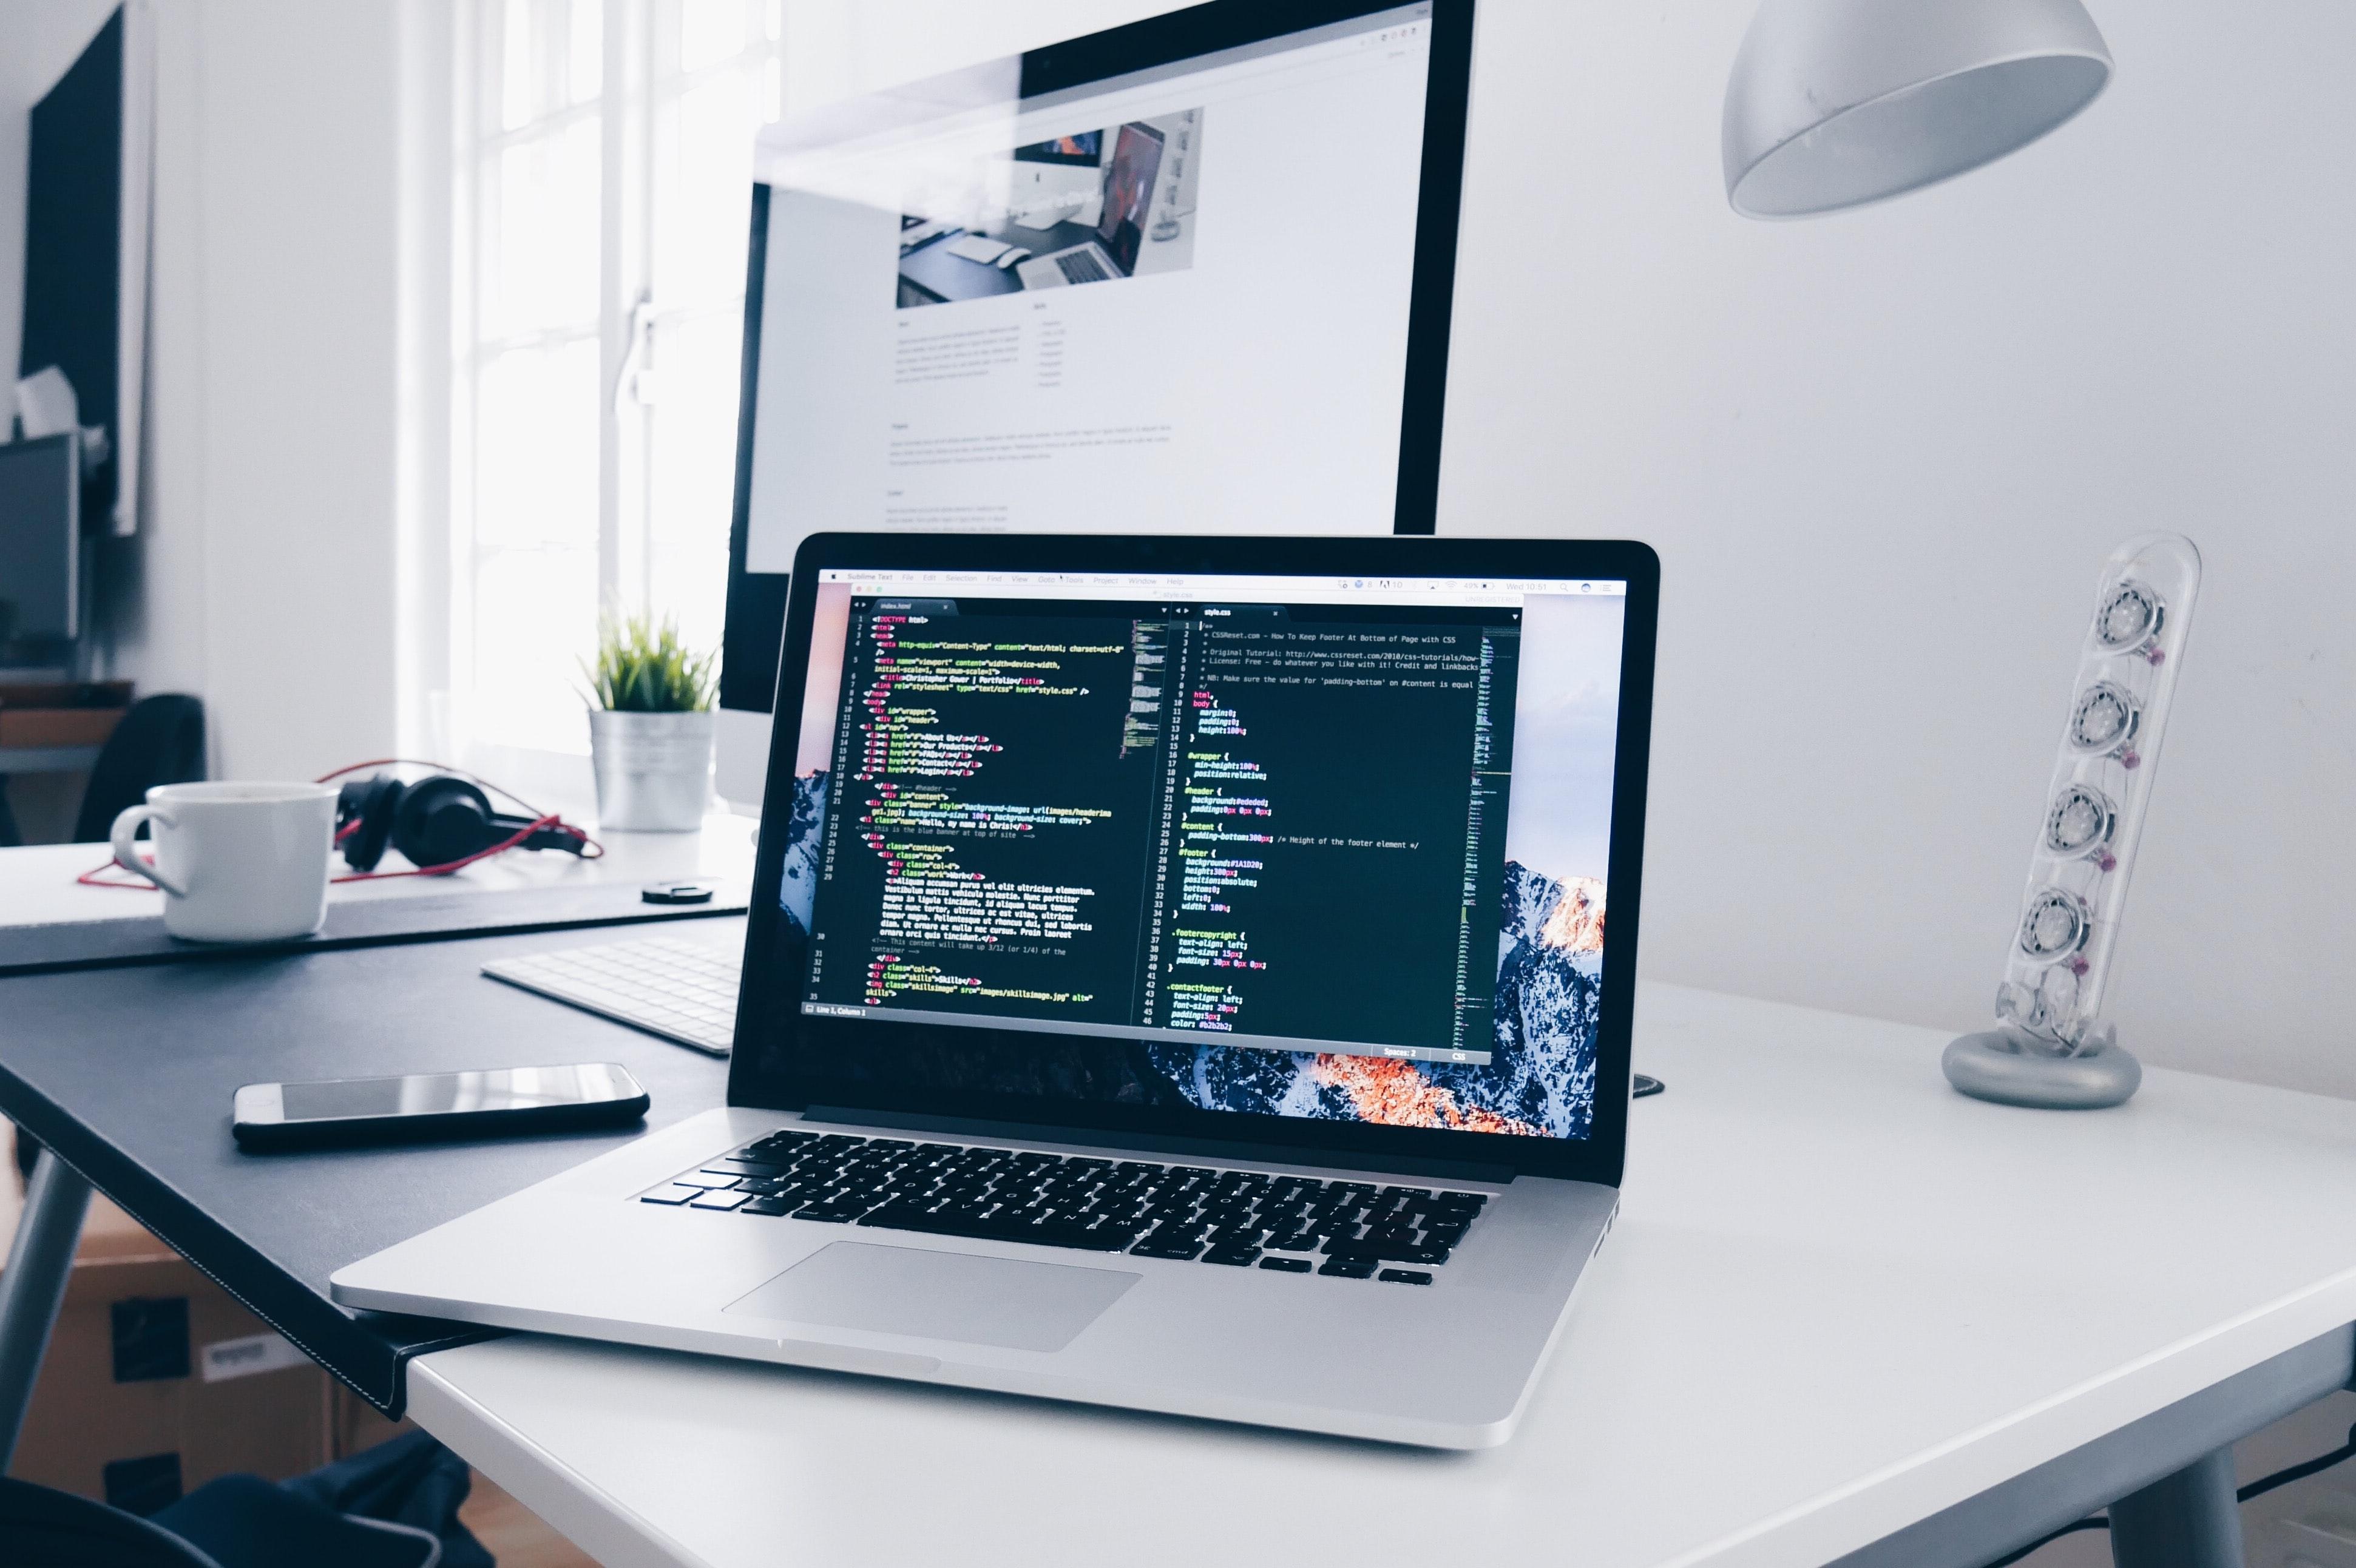 Roofing website design being worked on by Algorithmic Global web developer